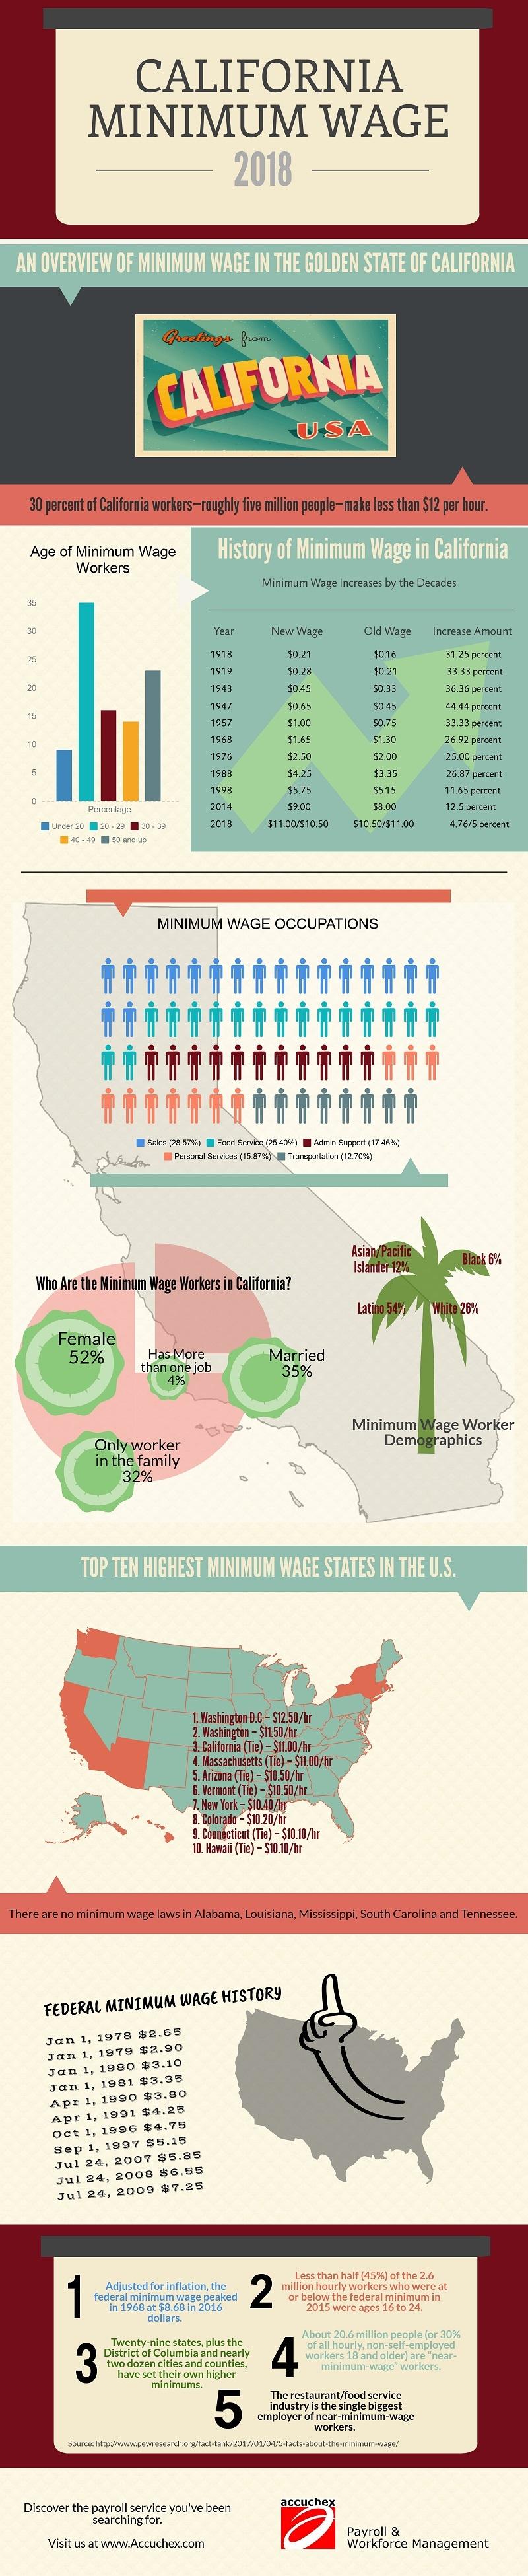 accuchex-california-minimum-wage-infographic